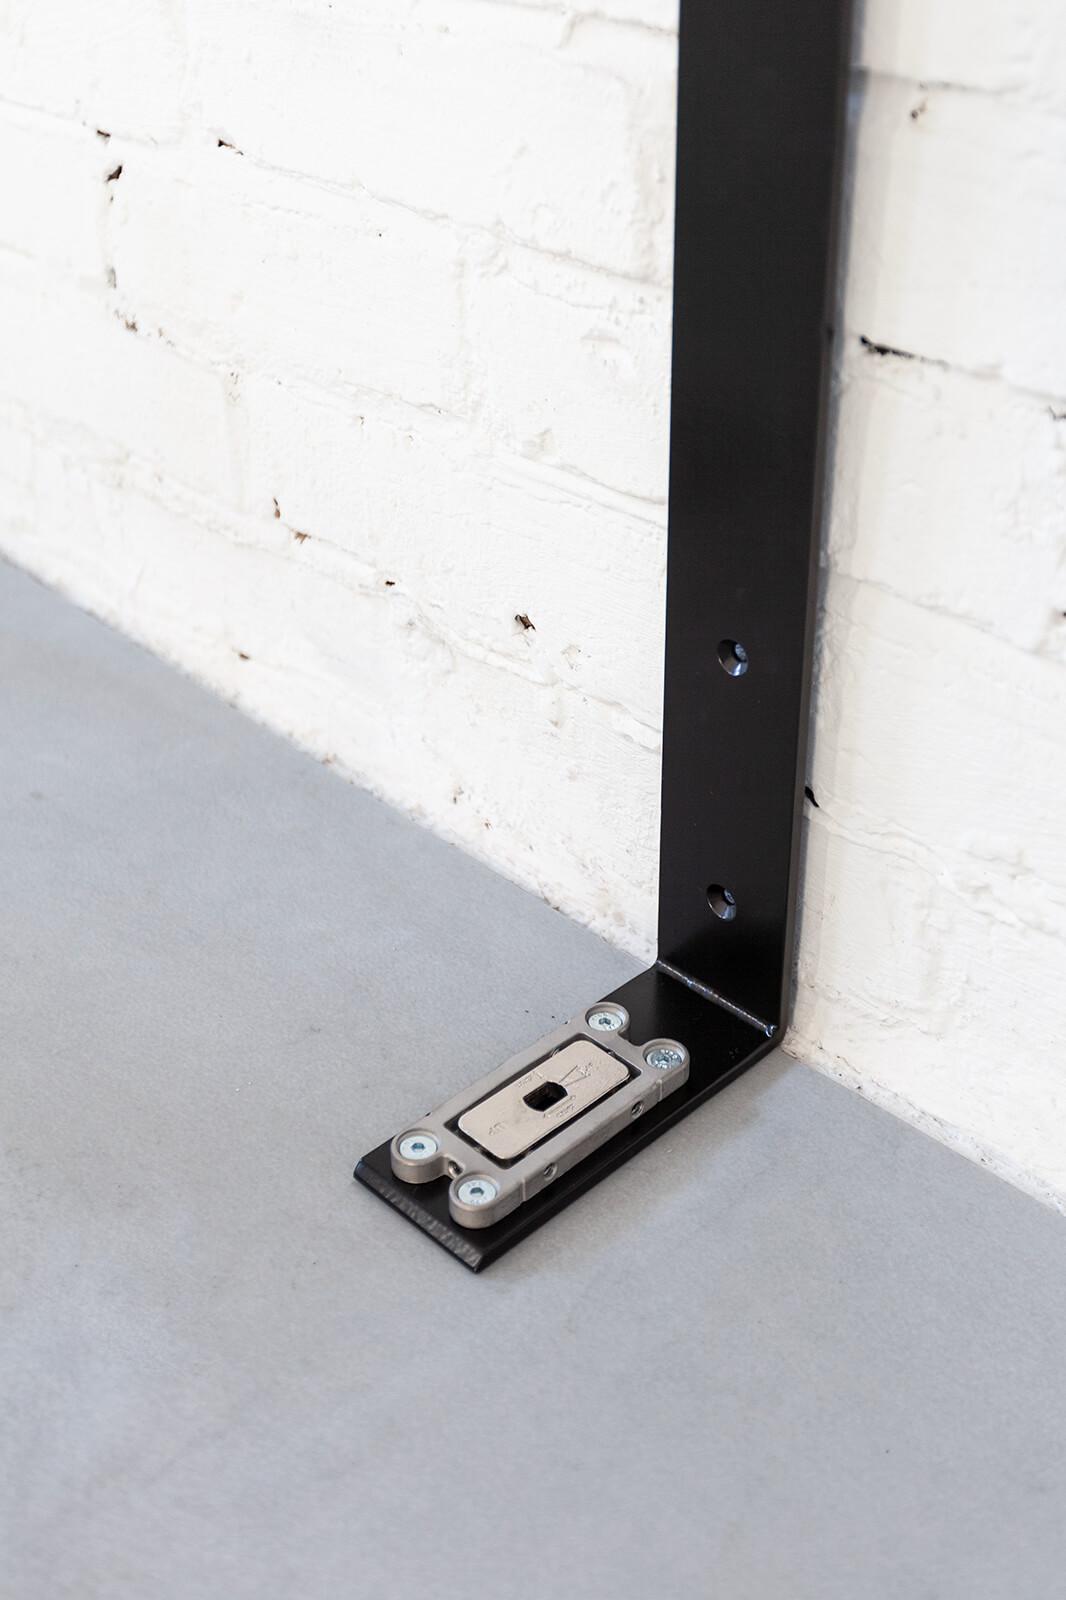 N51E12 - Pivot - Schwingtür - Bodenaufnahme - Bodenelement - Flachzarge